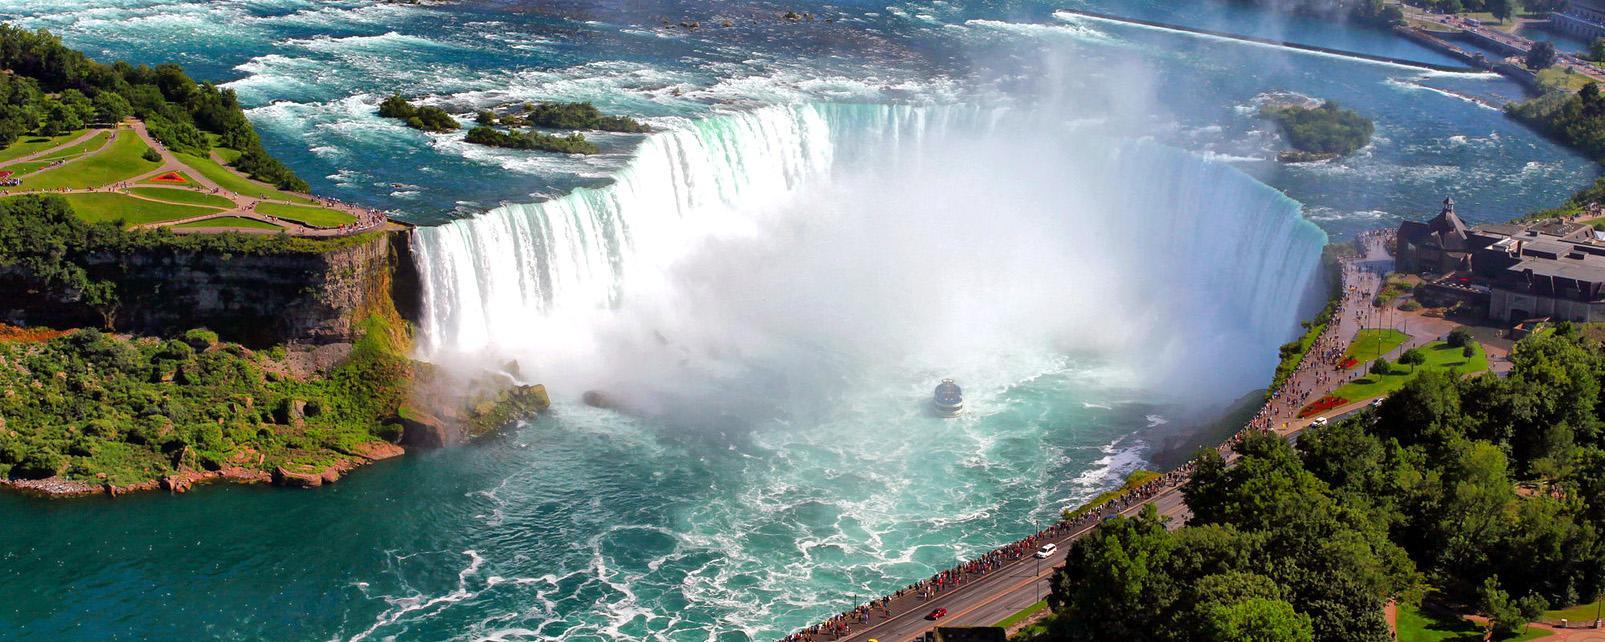 Tourisme Ontario 2017 : Visiter Ontario, Canada